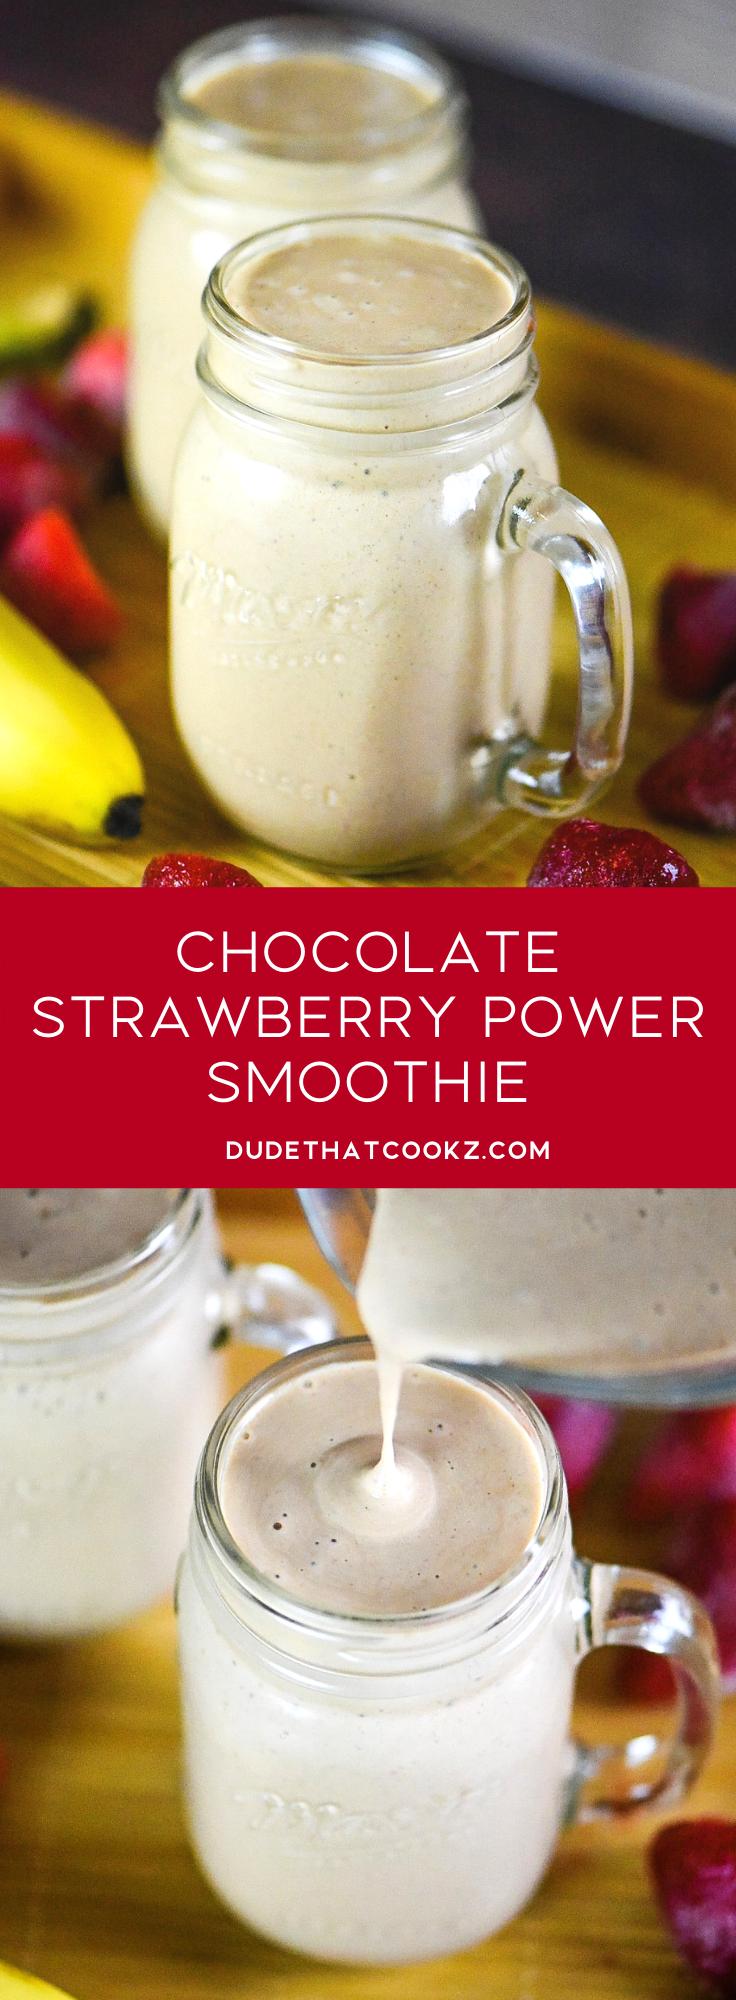 Chocolate Strawberry Power Smoothie